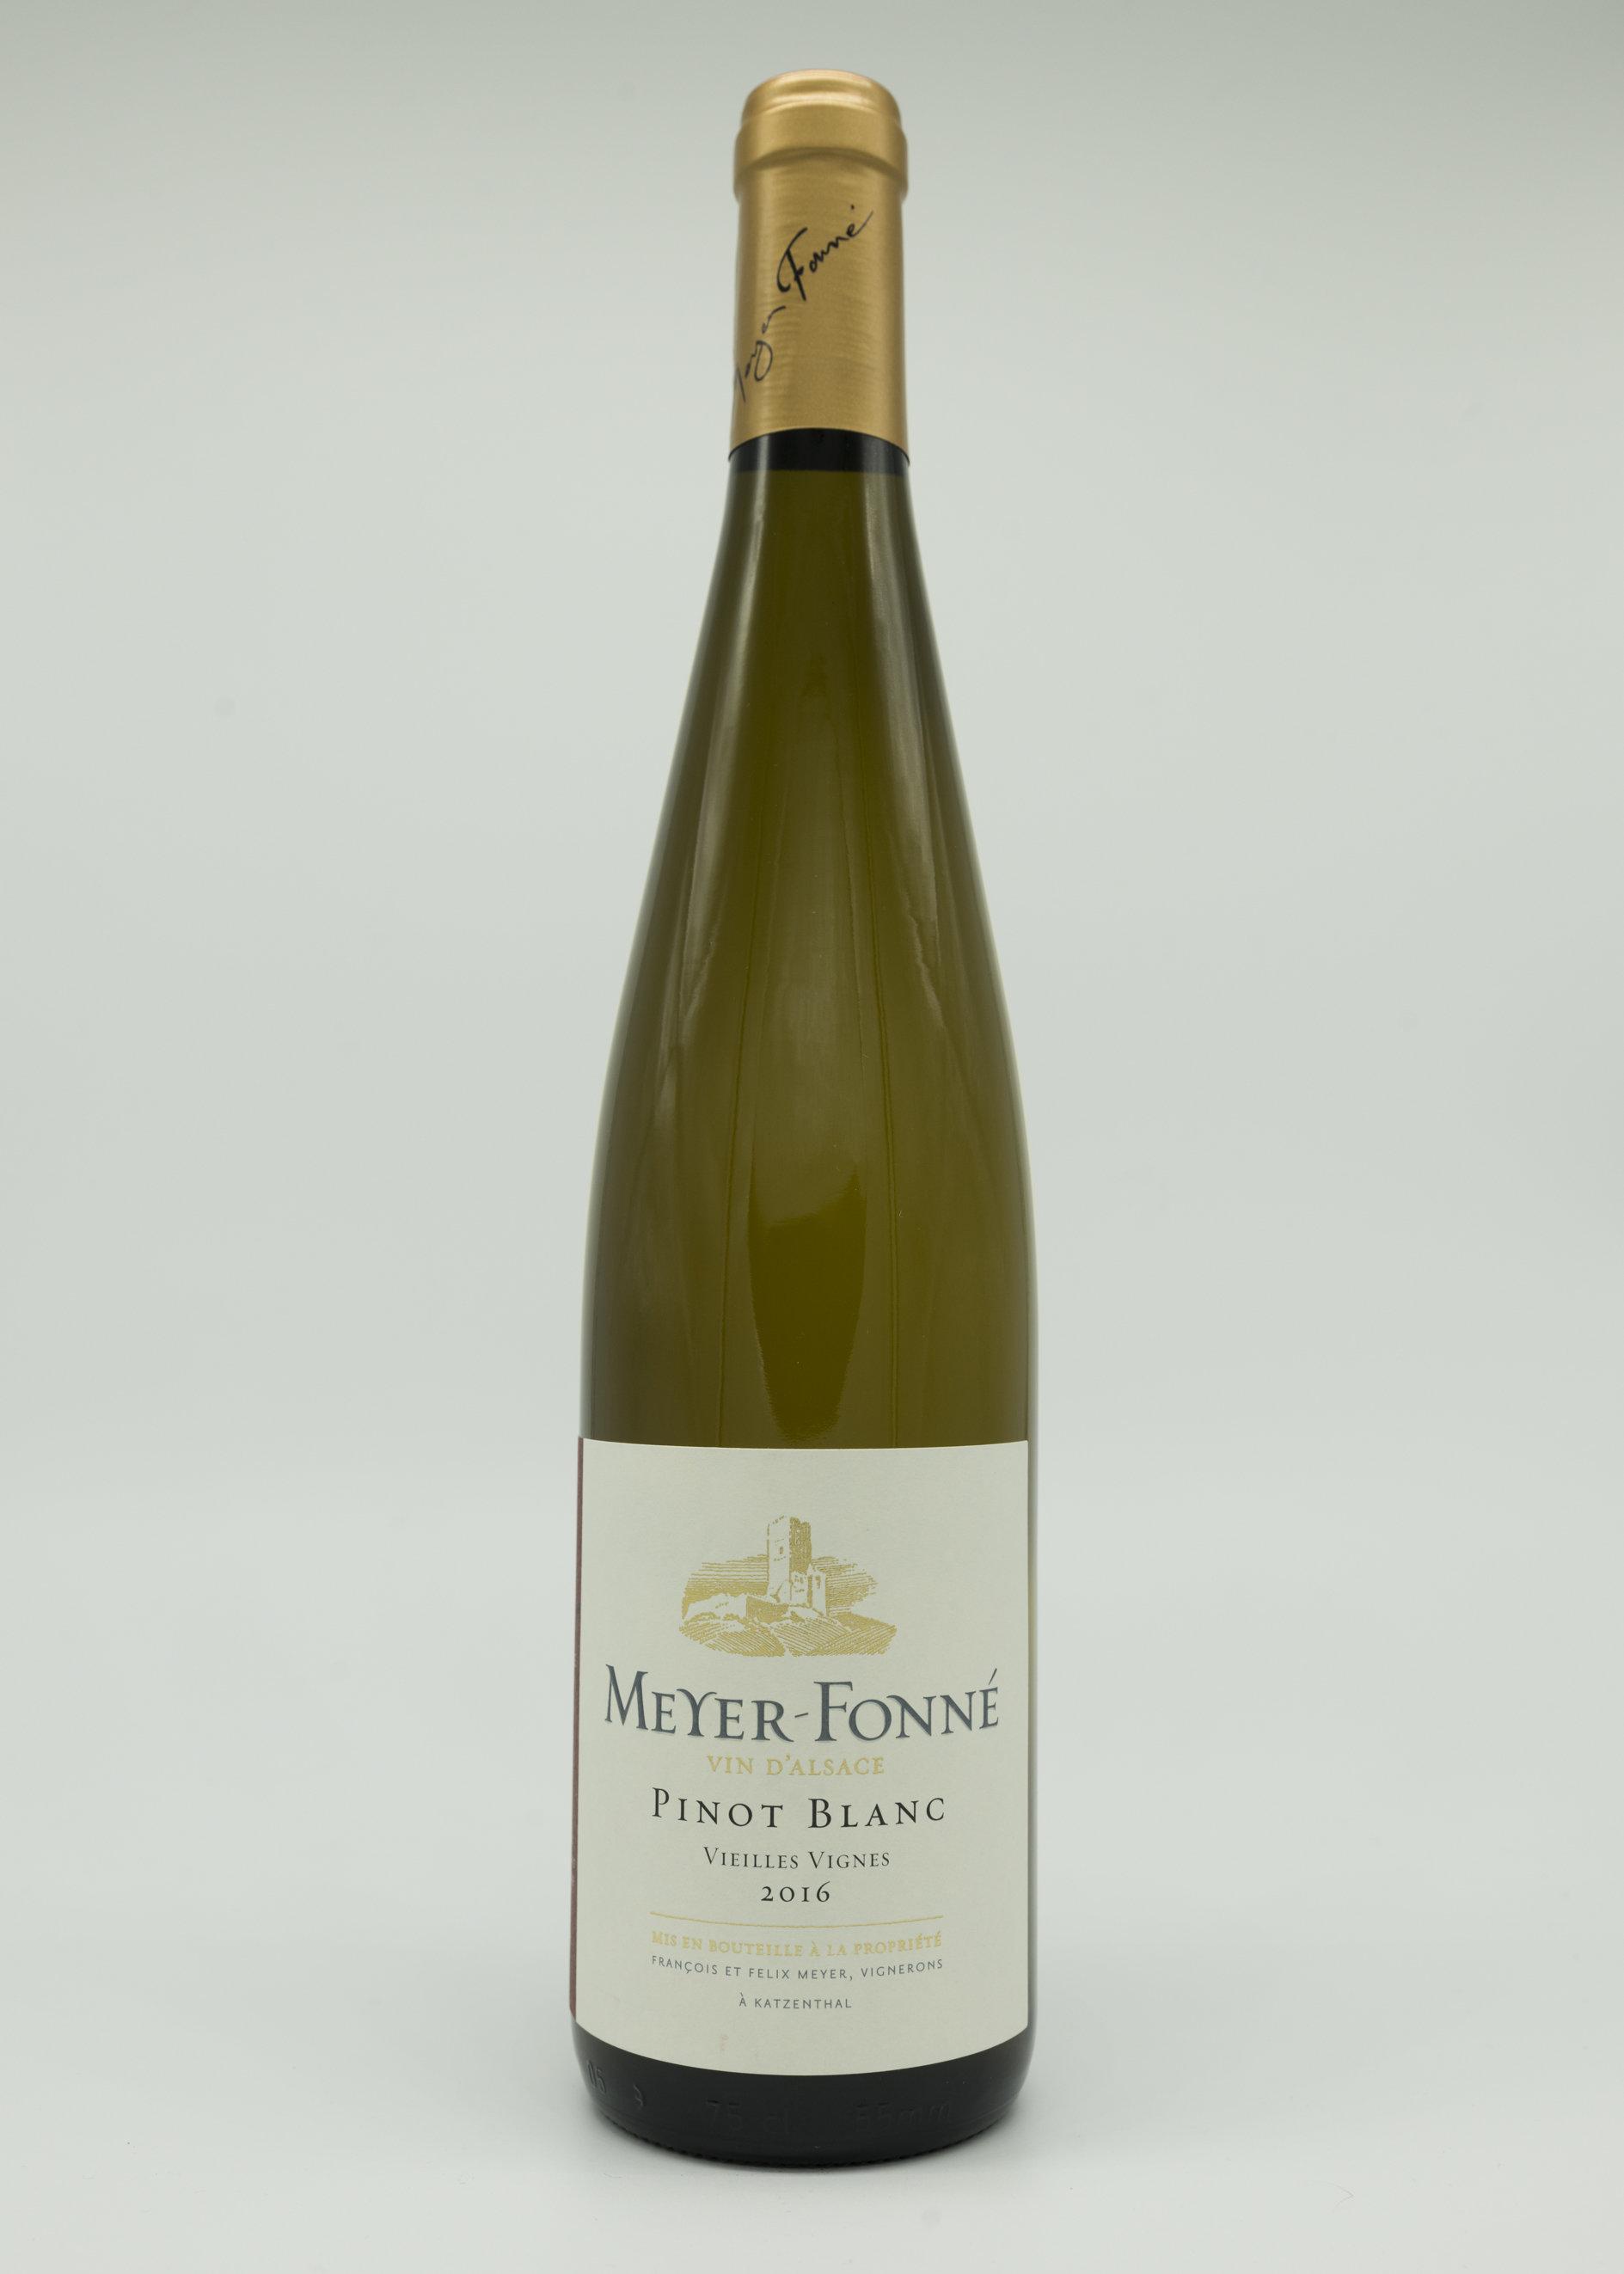 Pinot Blanc Vielles Vignes, Meyer Fonne, 2017 00062